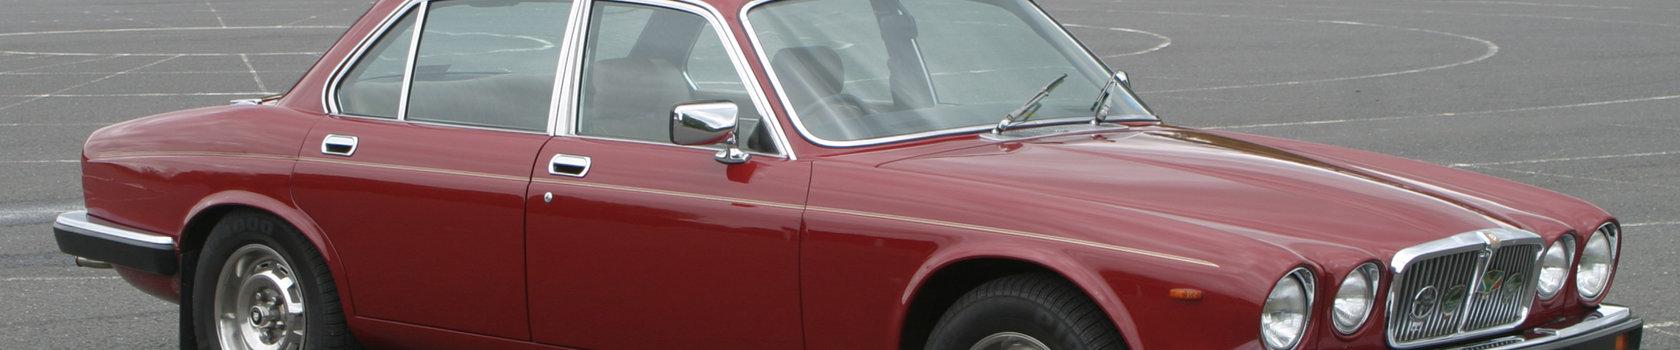 Jaguar Xj6 Series 3 3 4 4 2 5 3 Litre Saloon